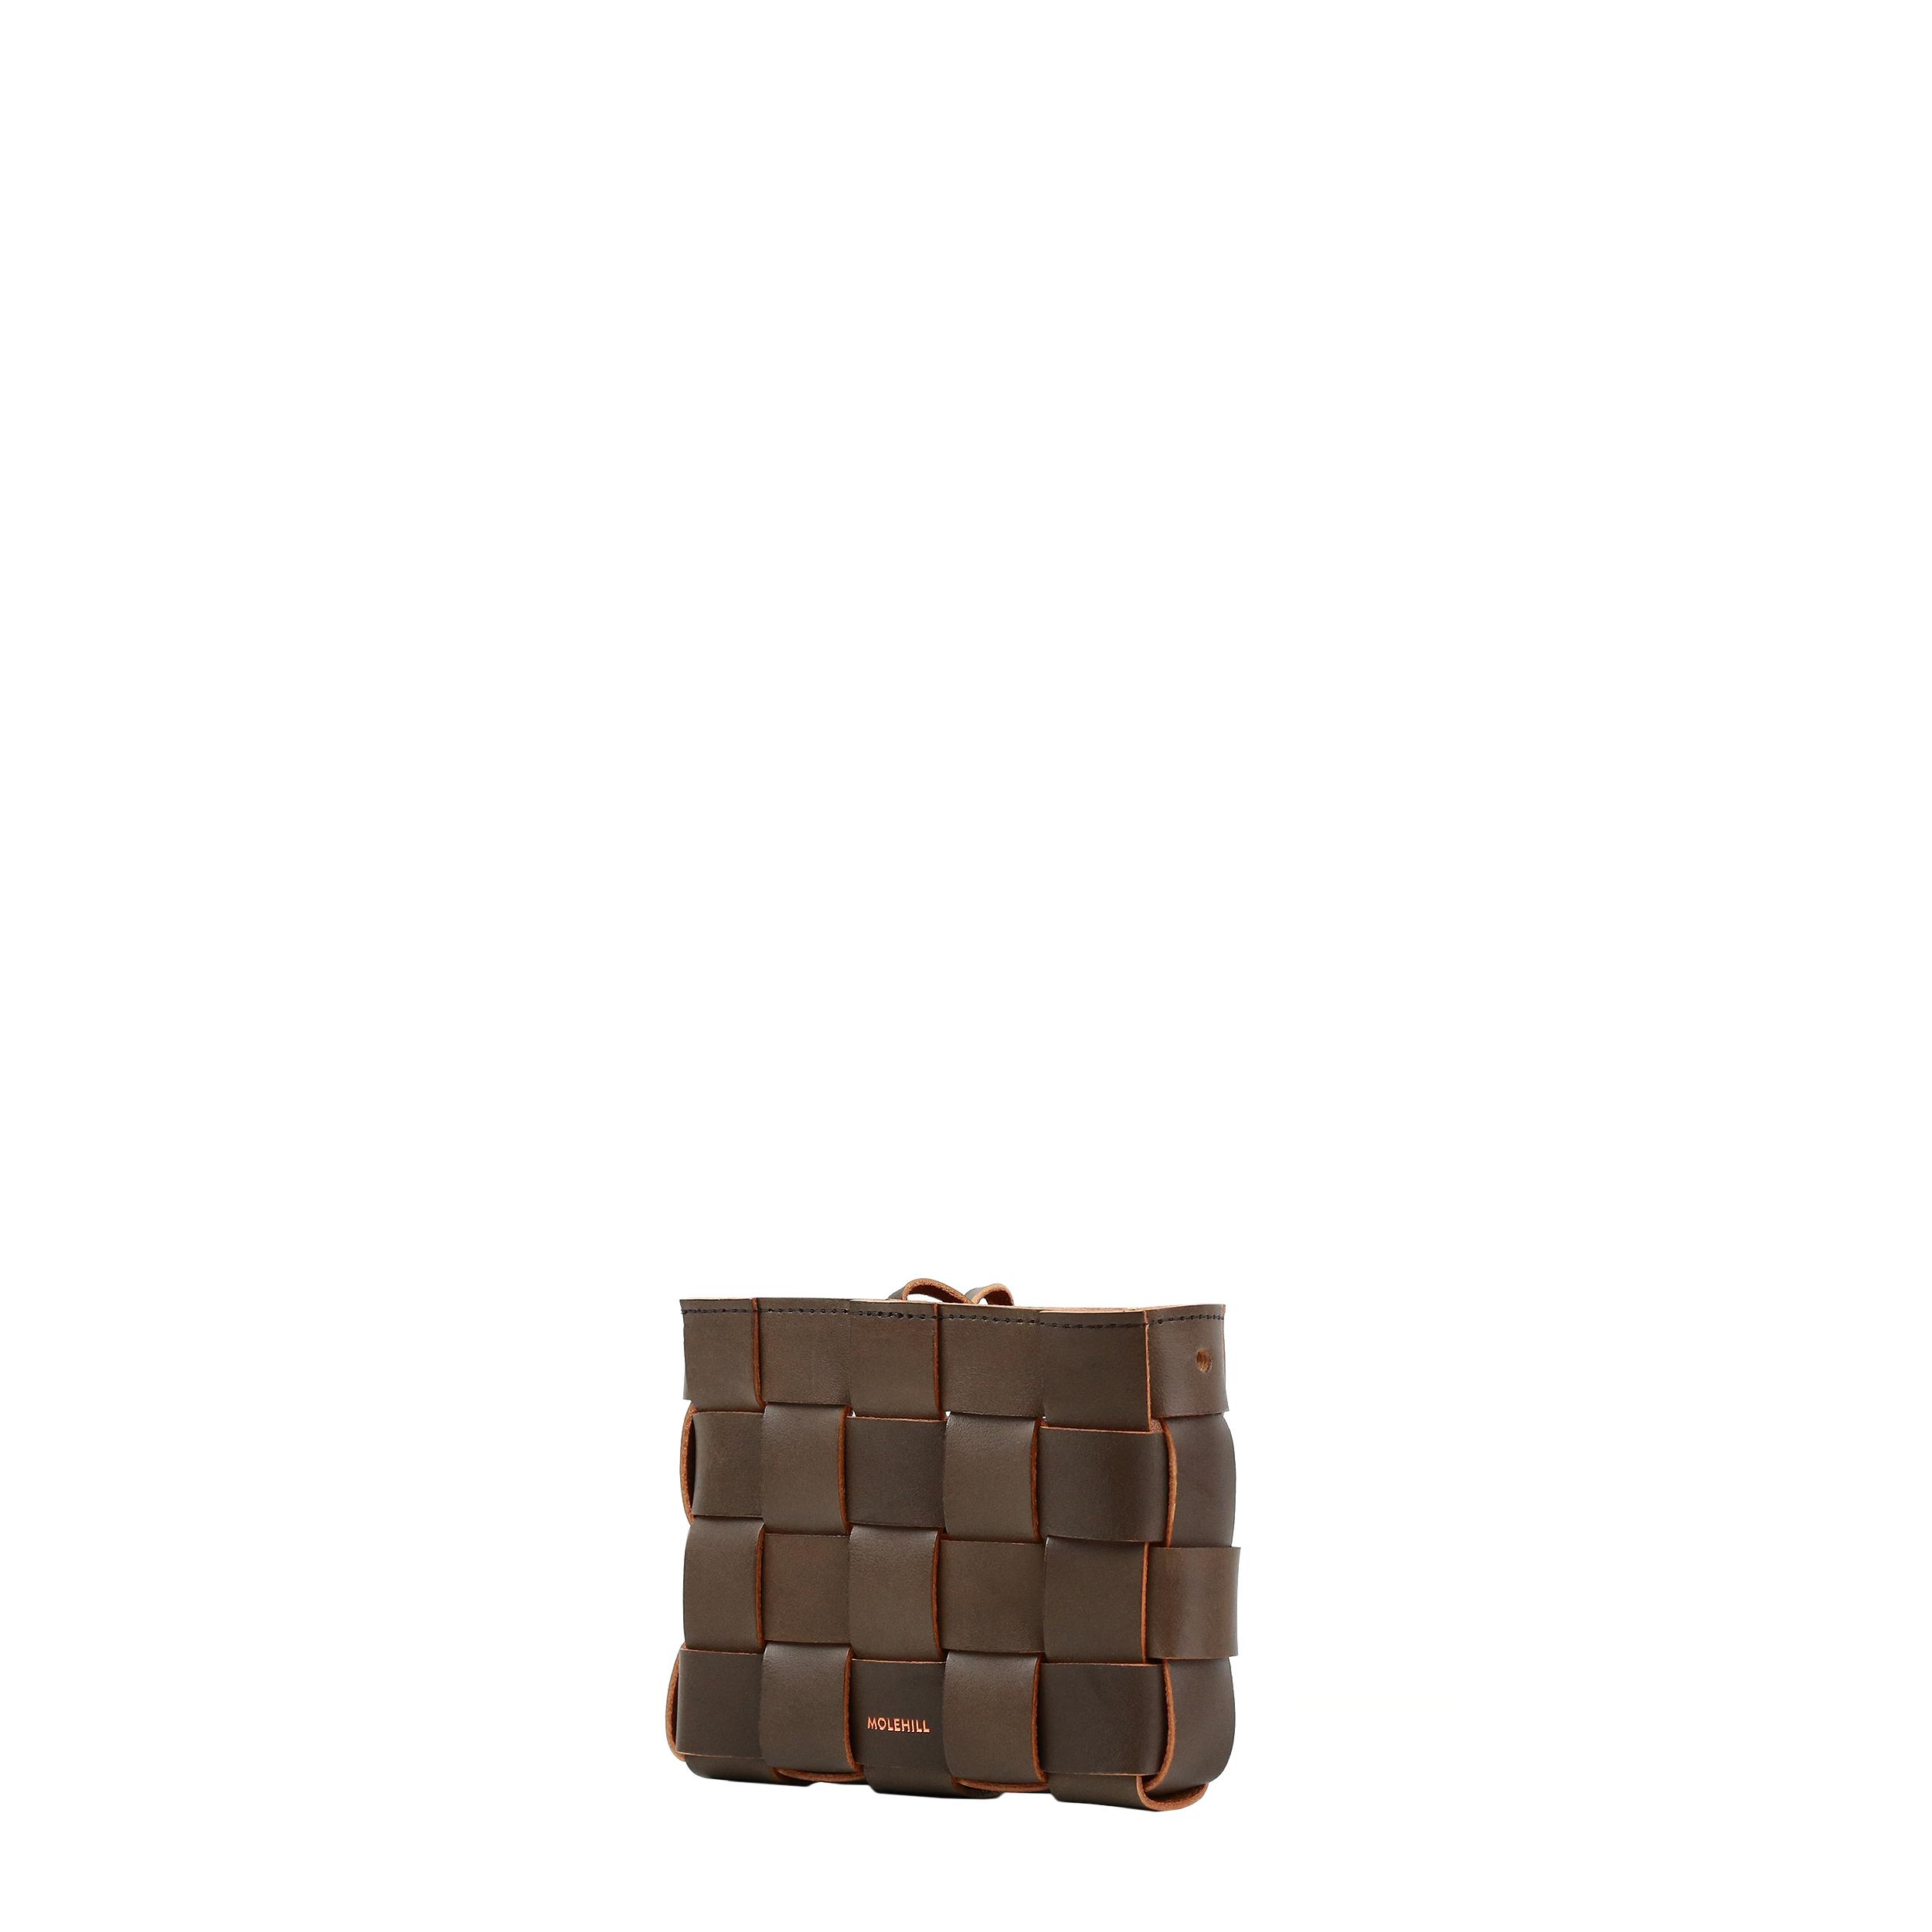 Pane Mini Crossbody Woven Bag Light Chocolate-2